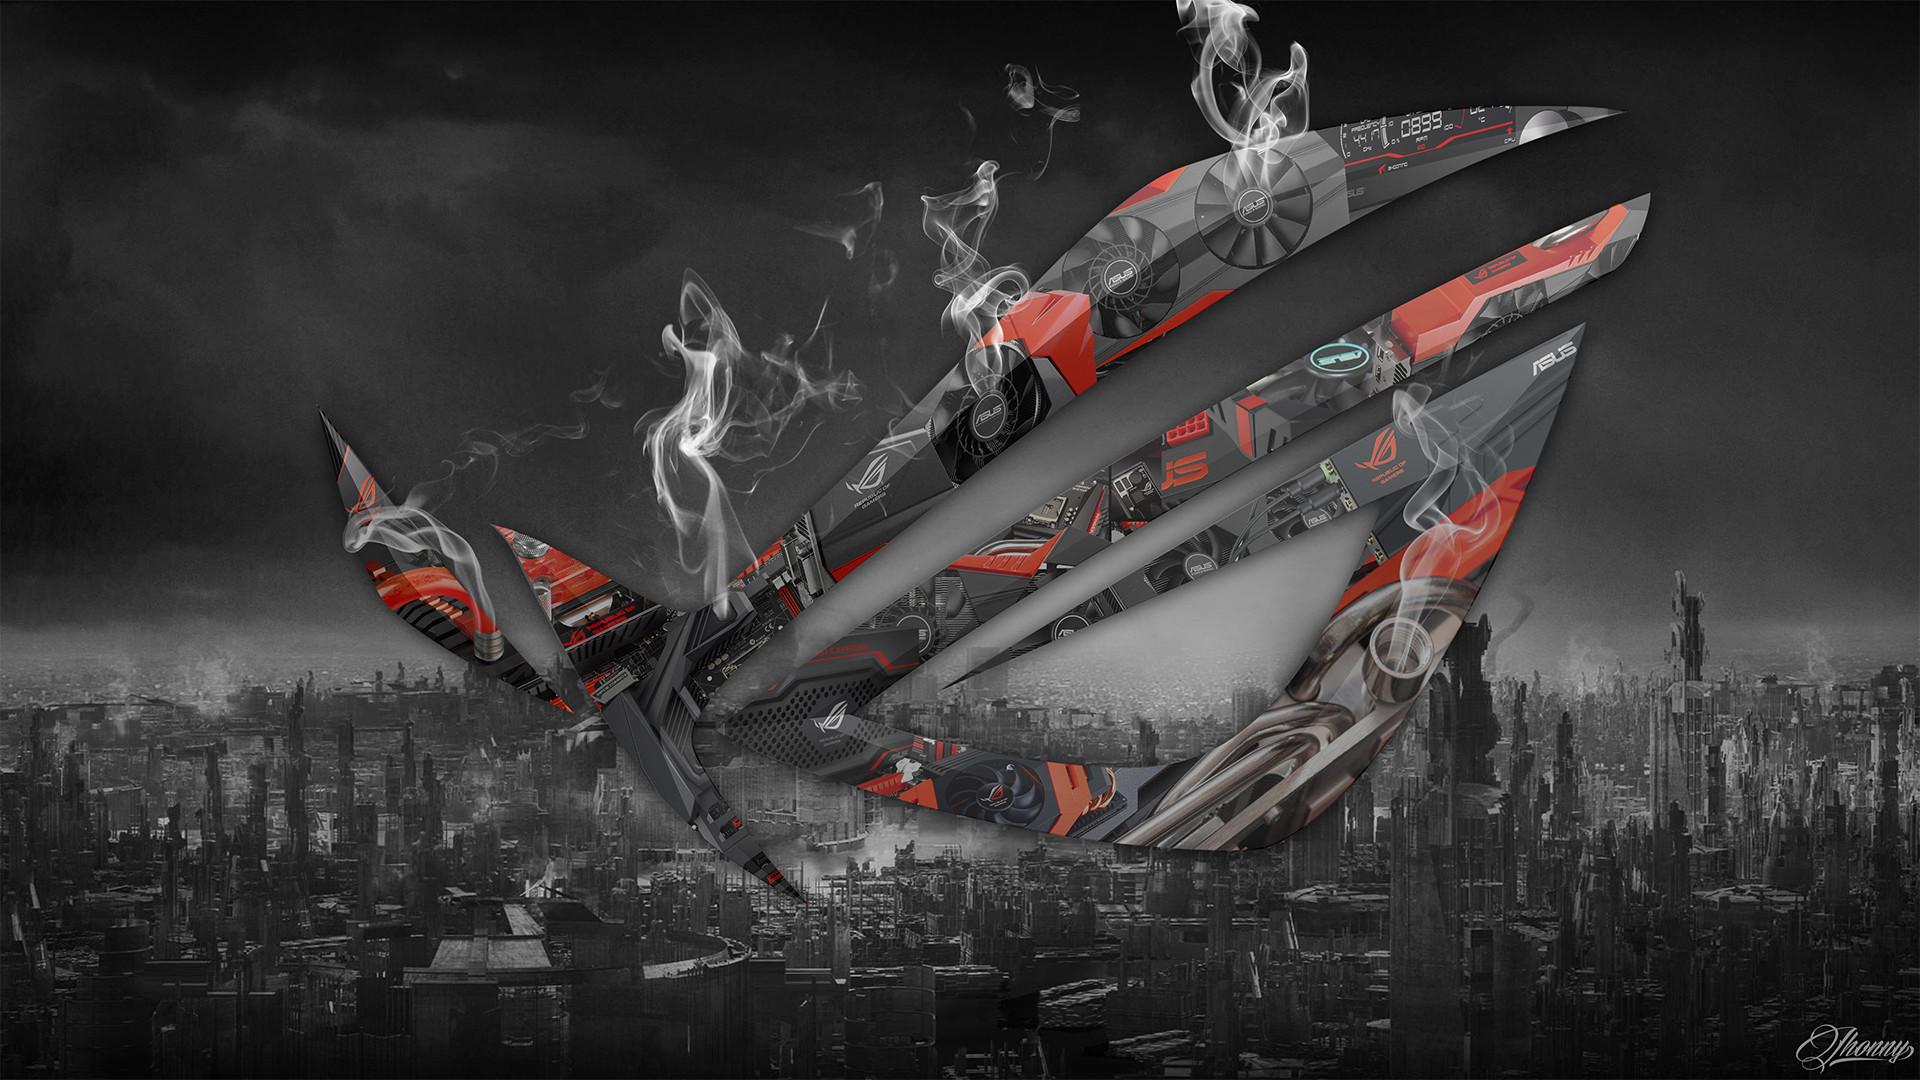 Unduh 6000+ Wallpaper Asus Transformers  Paling Keren